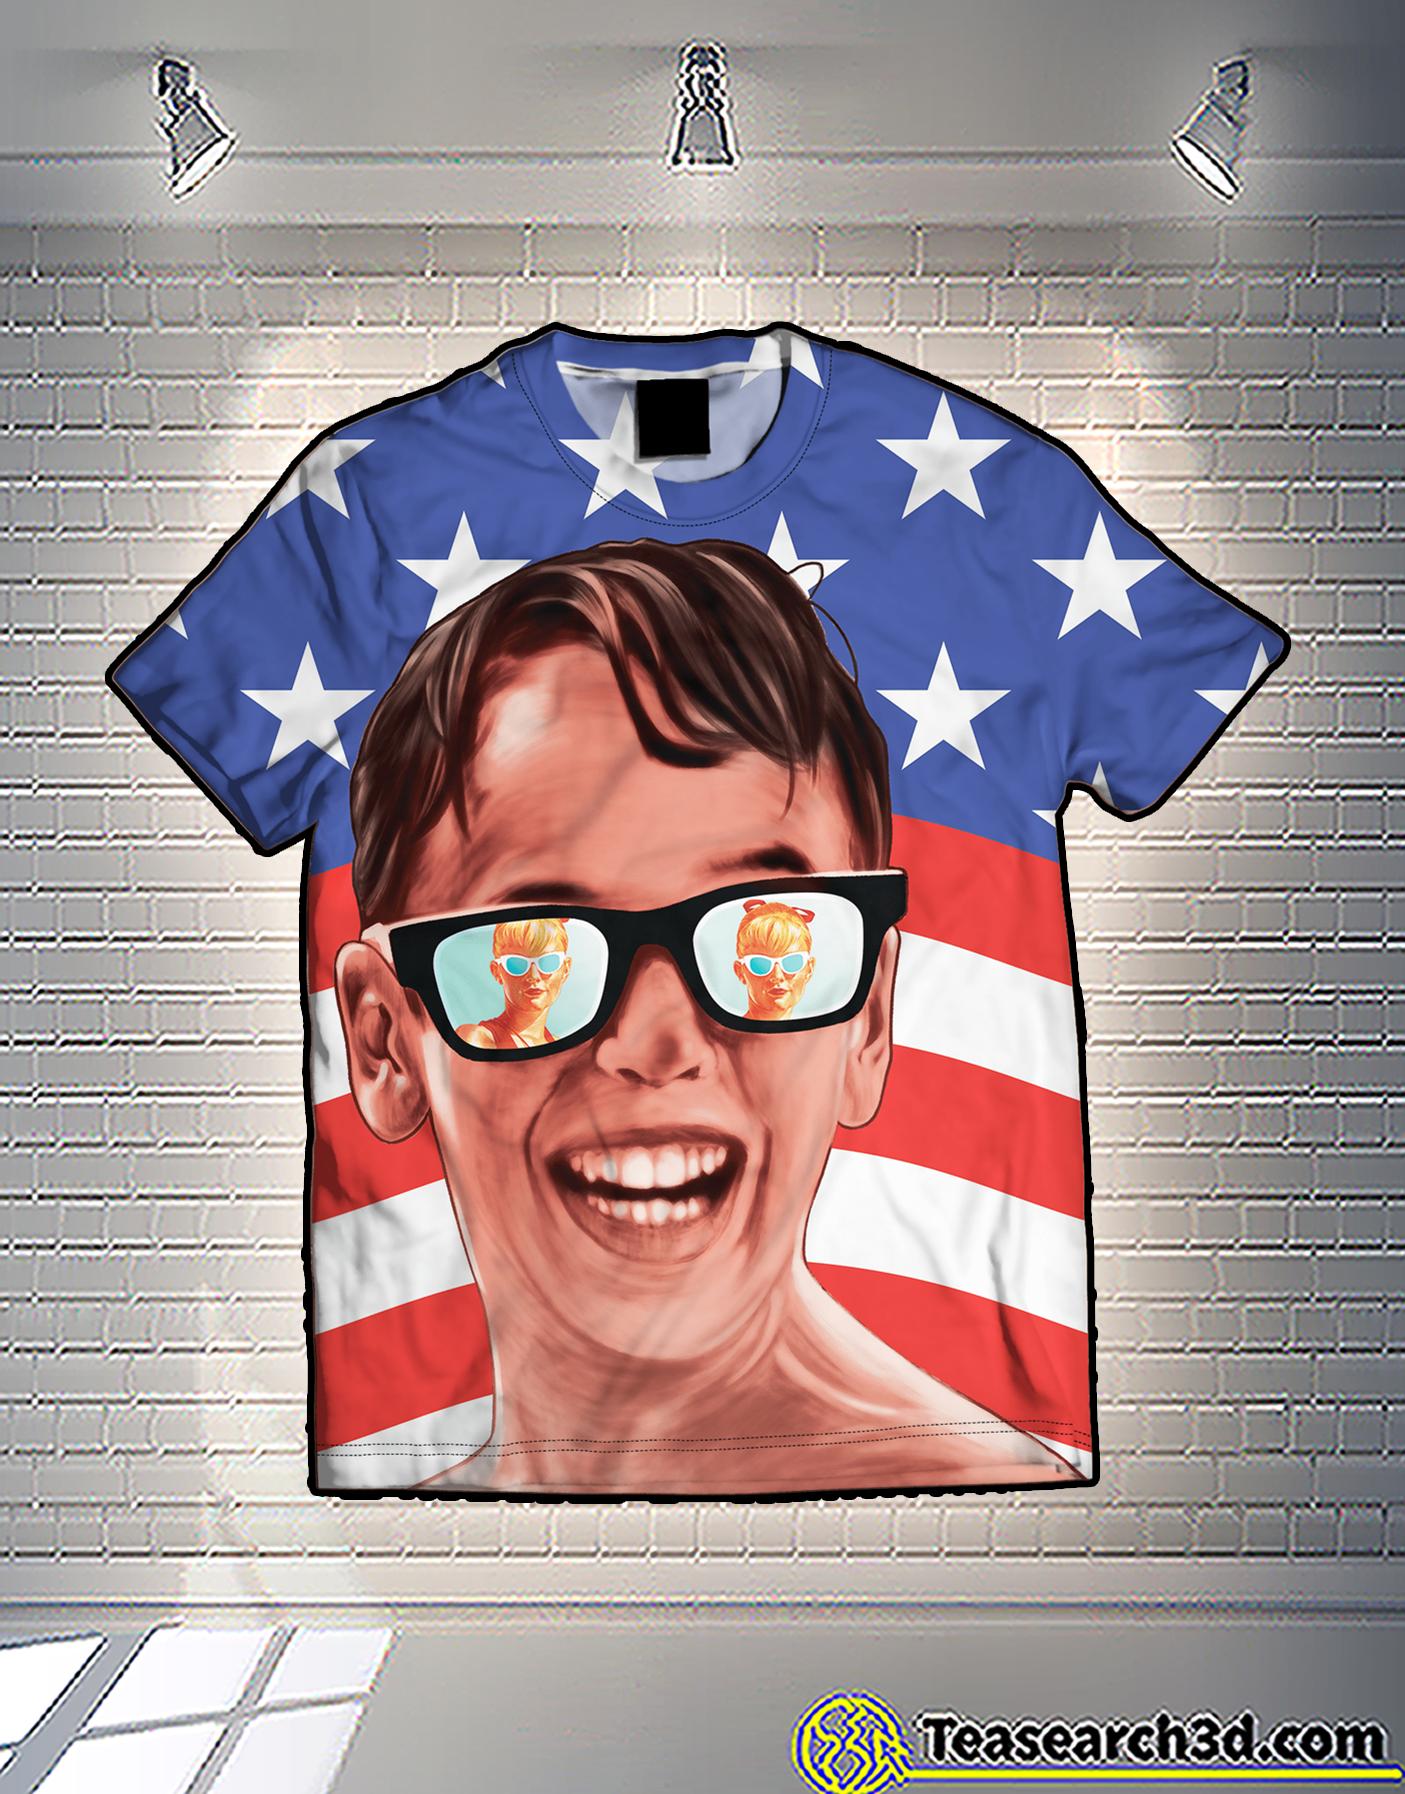 Sandlot patriot american flag 3d shirt